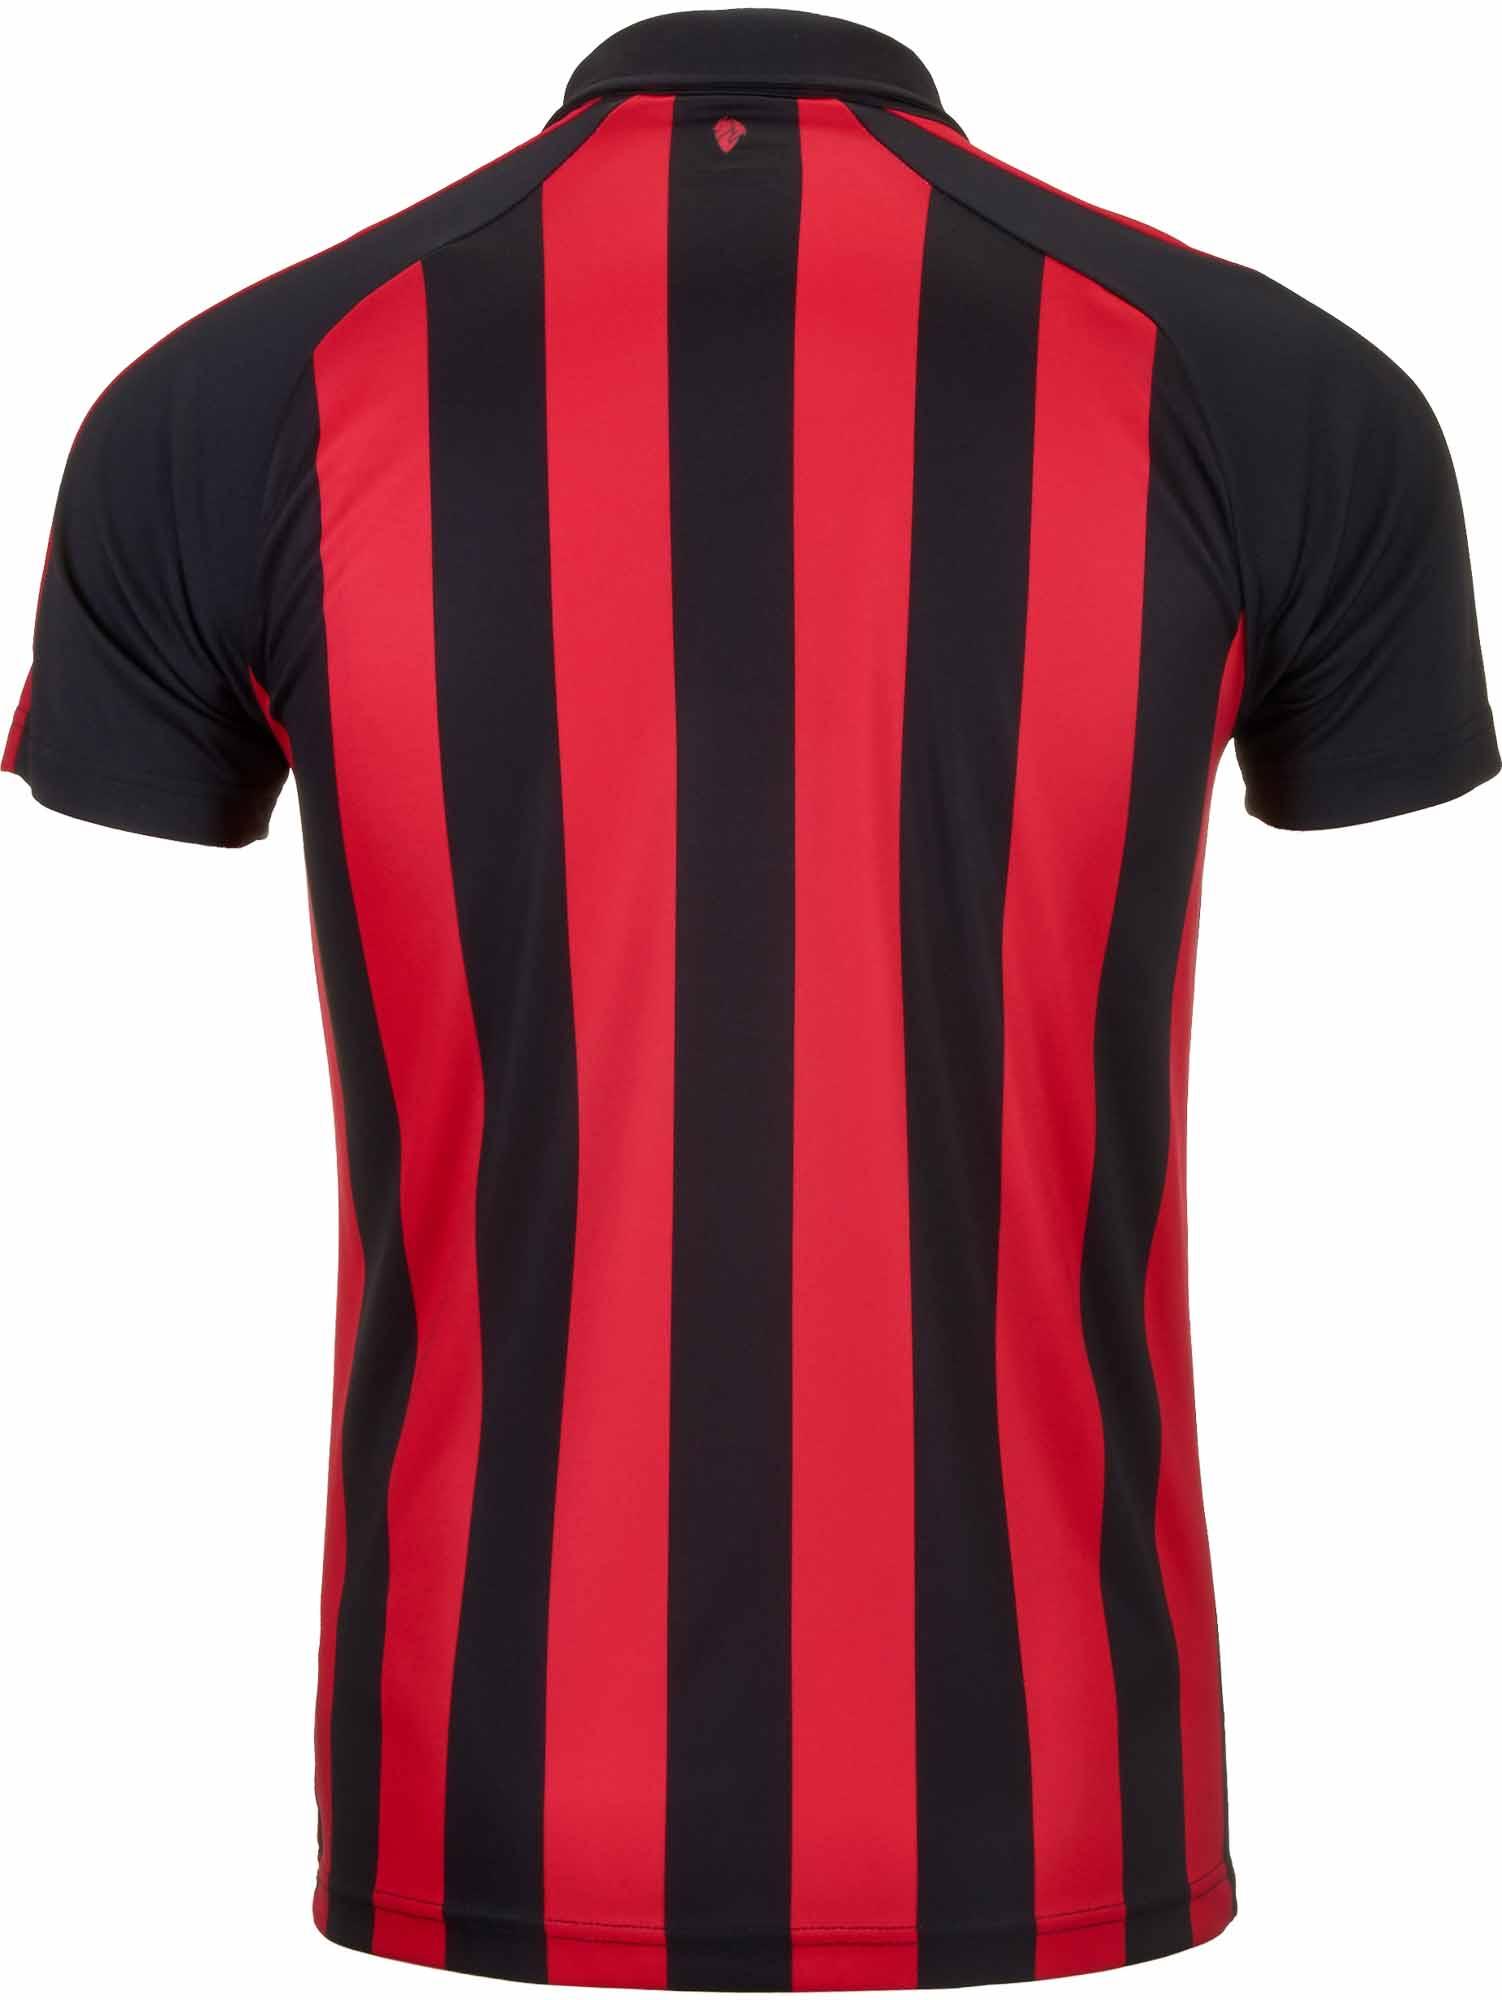 PUMA AC Milan Home Jersey Youth Chili PepperBlack SoccerPro